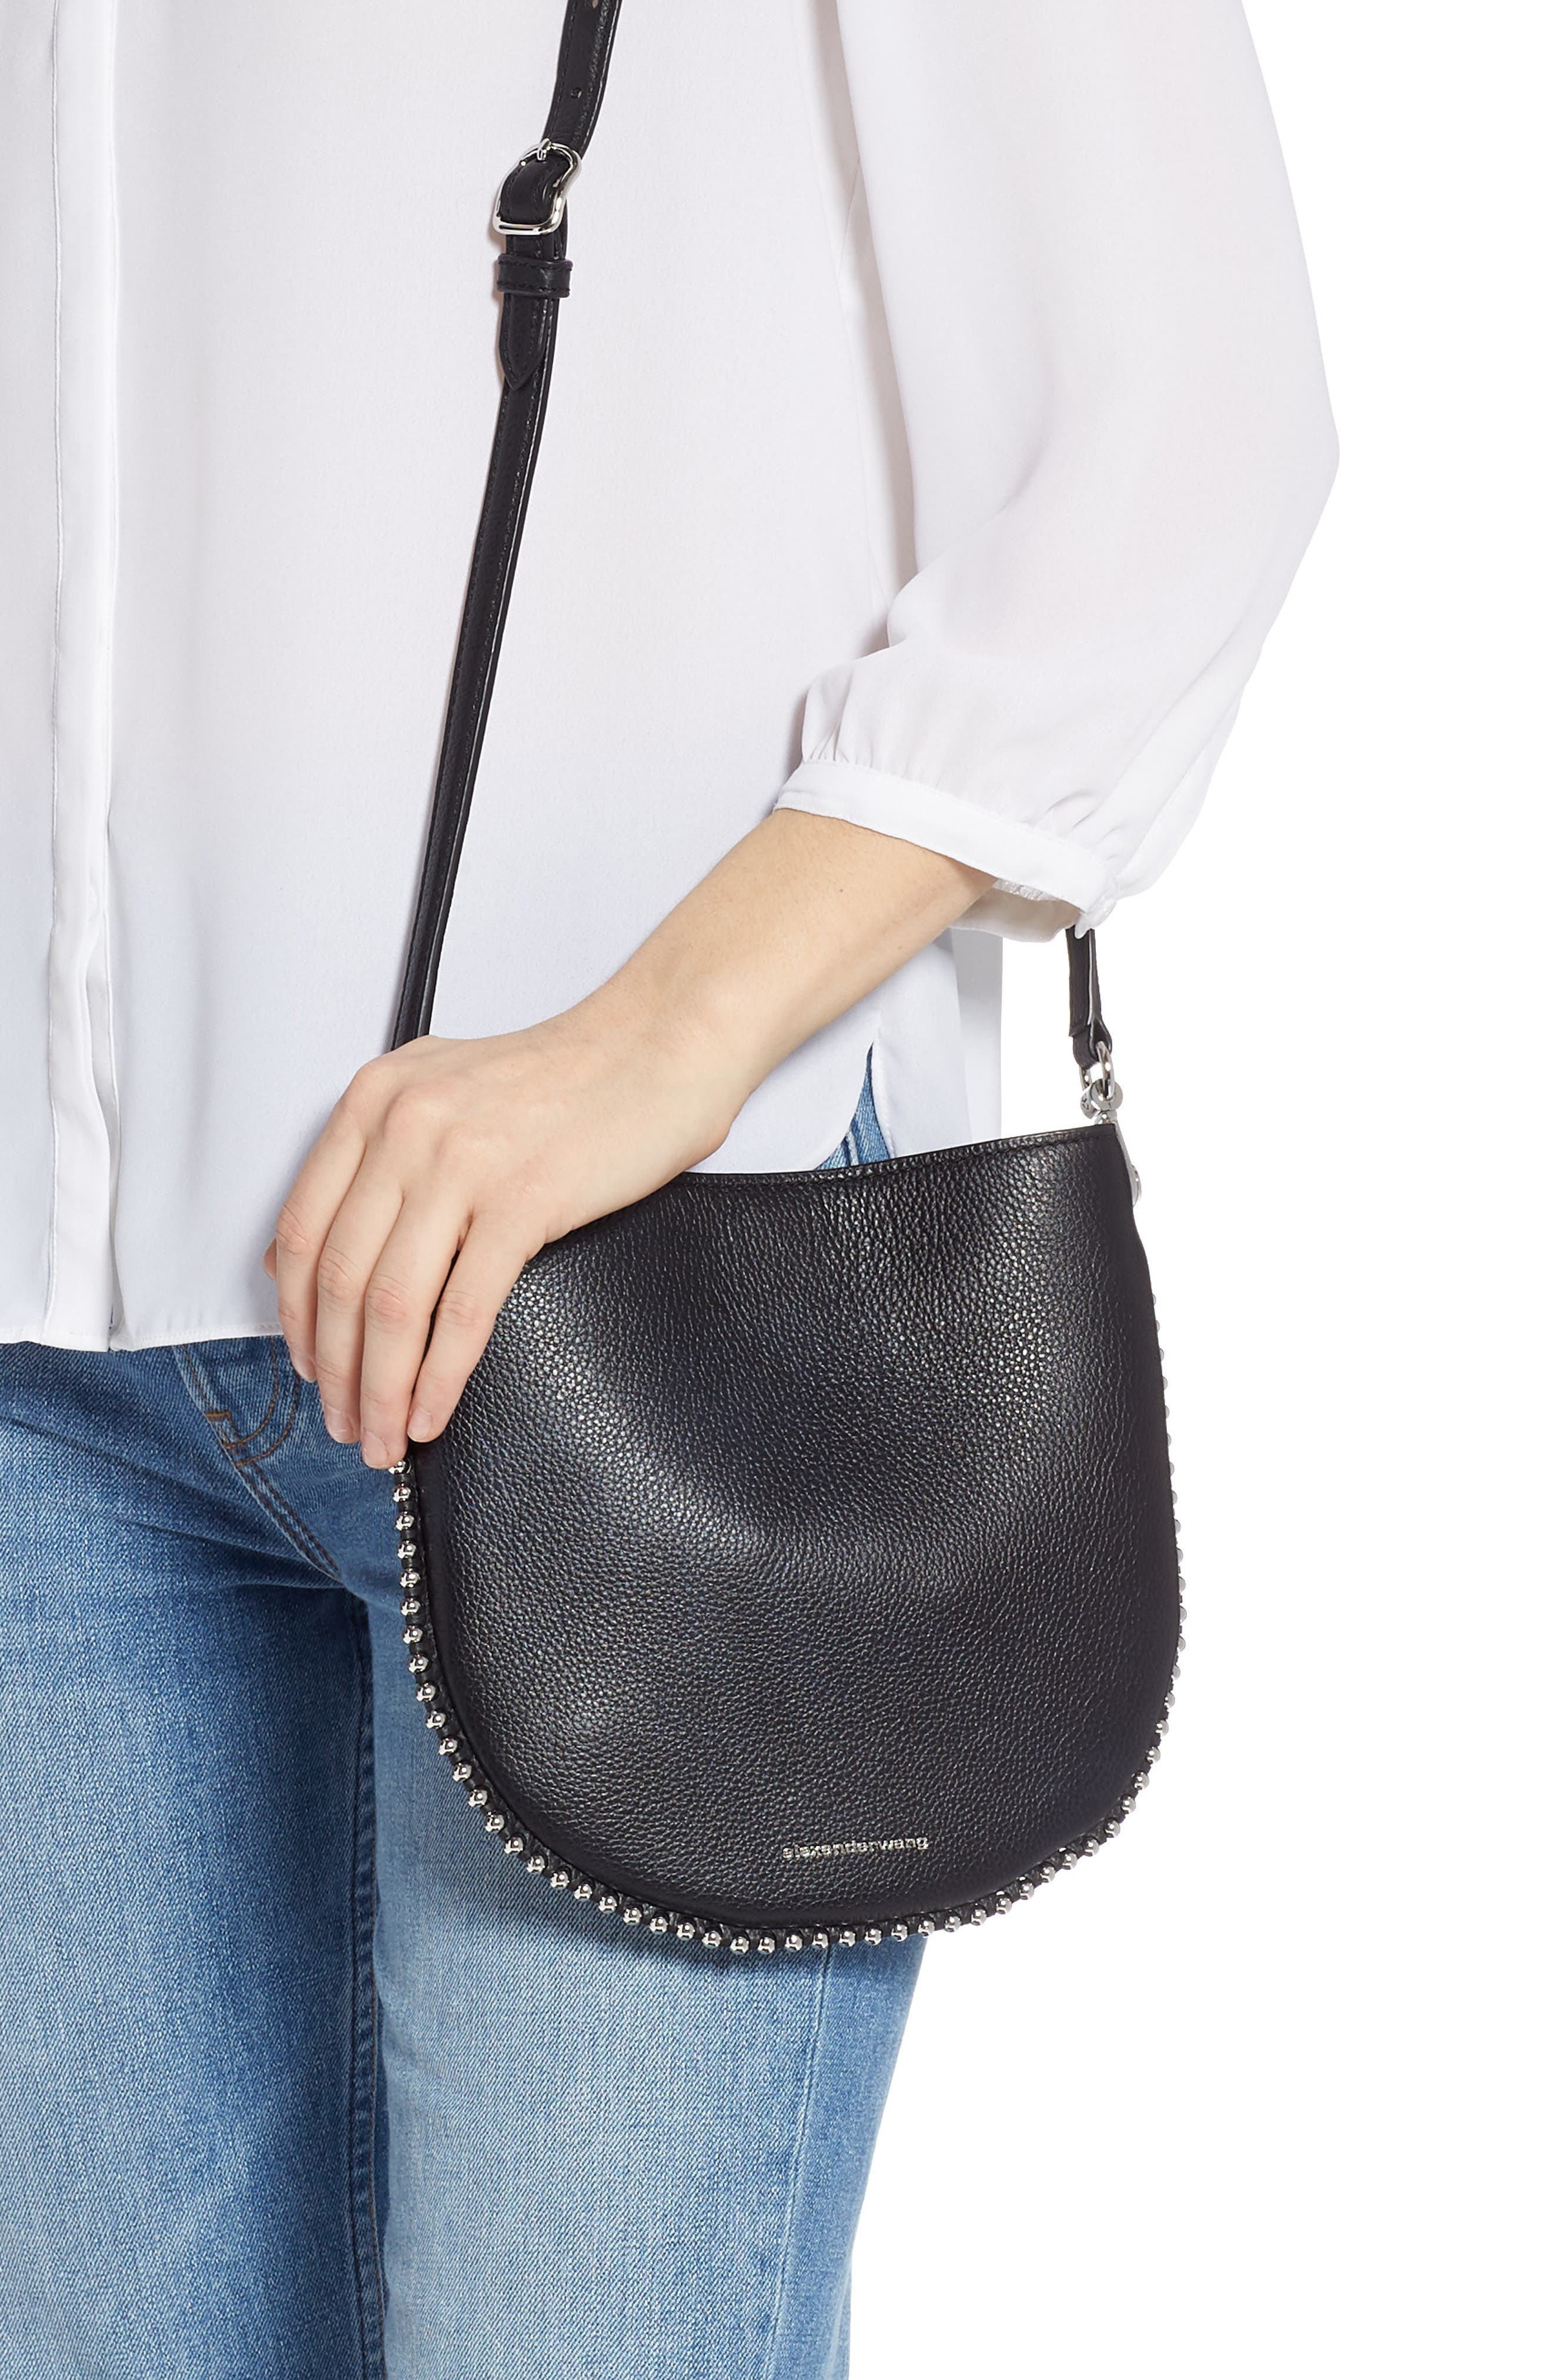 ALEXANDER WANG, Mini Roxy Leather Hobo Bag, Alternate thumbnail 2, color, BLACK/ WHITE